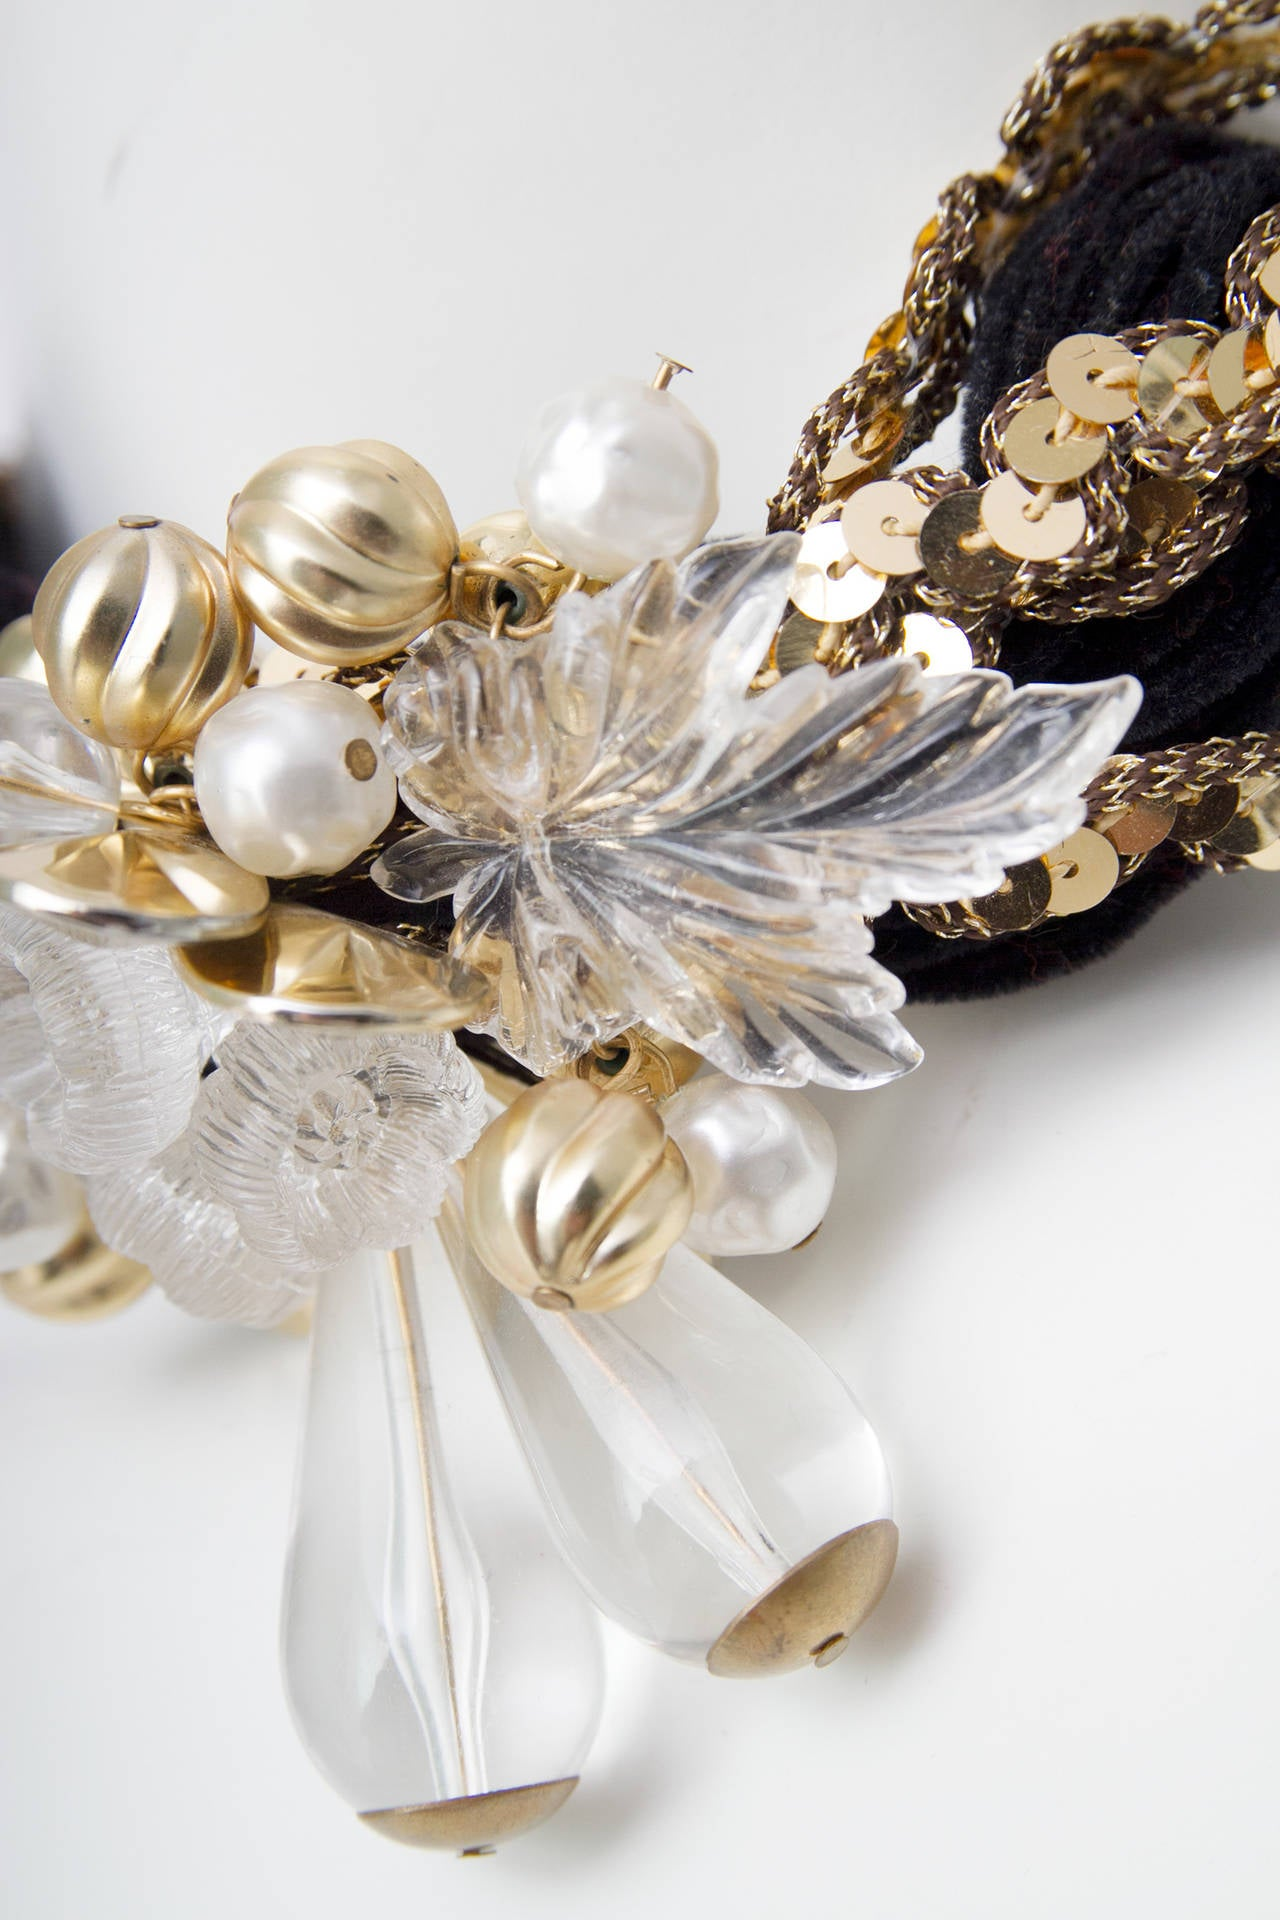 70s Pierre Cardin Black Beads & Gold Sequin Necklace 7